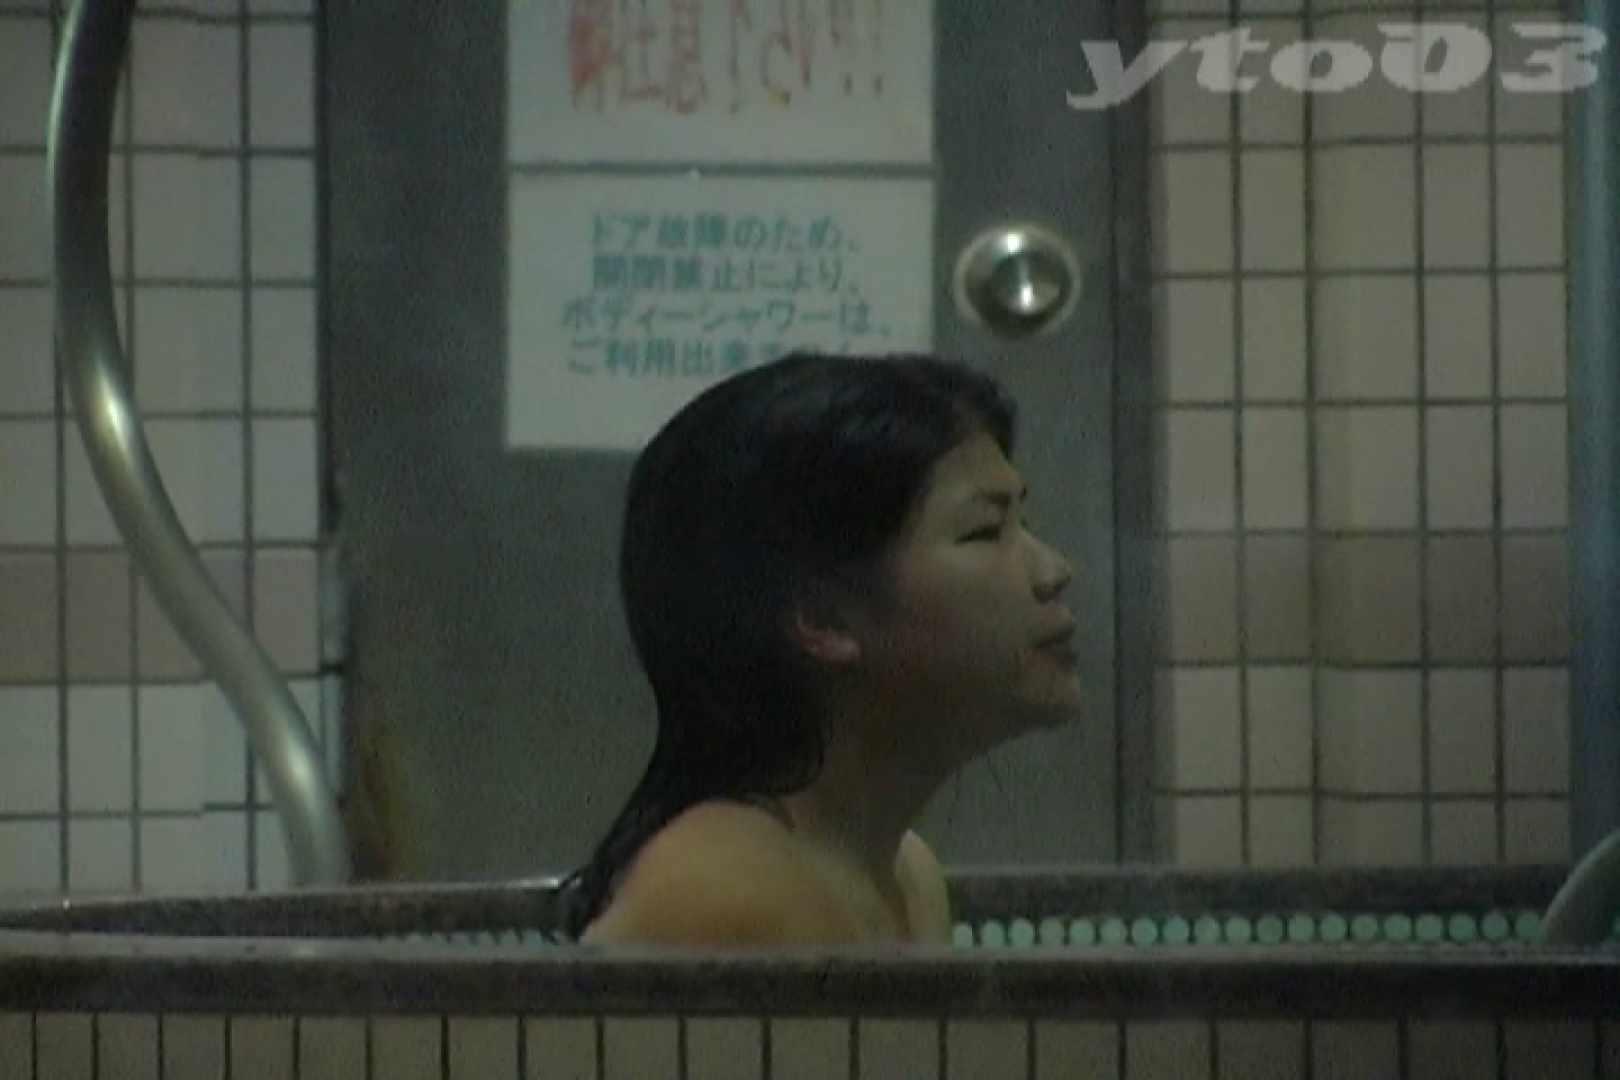 ▲復活限定▲合宿ホテル女風呂盗撮 Vol.17 合宿中の出来事   名作 盗撮 100画像 17